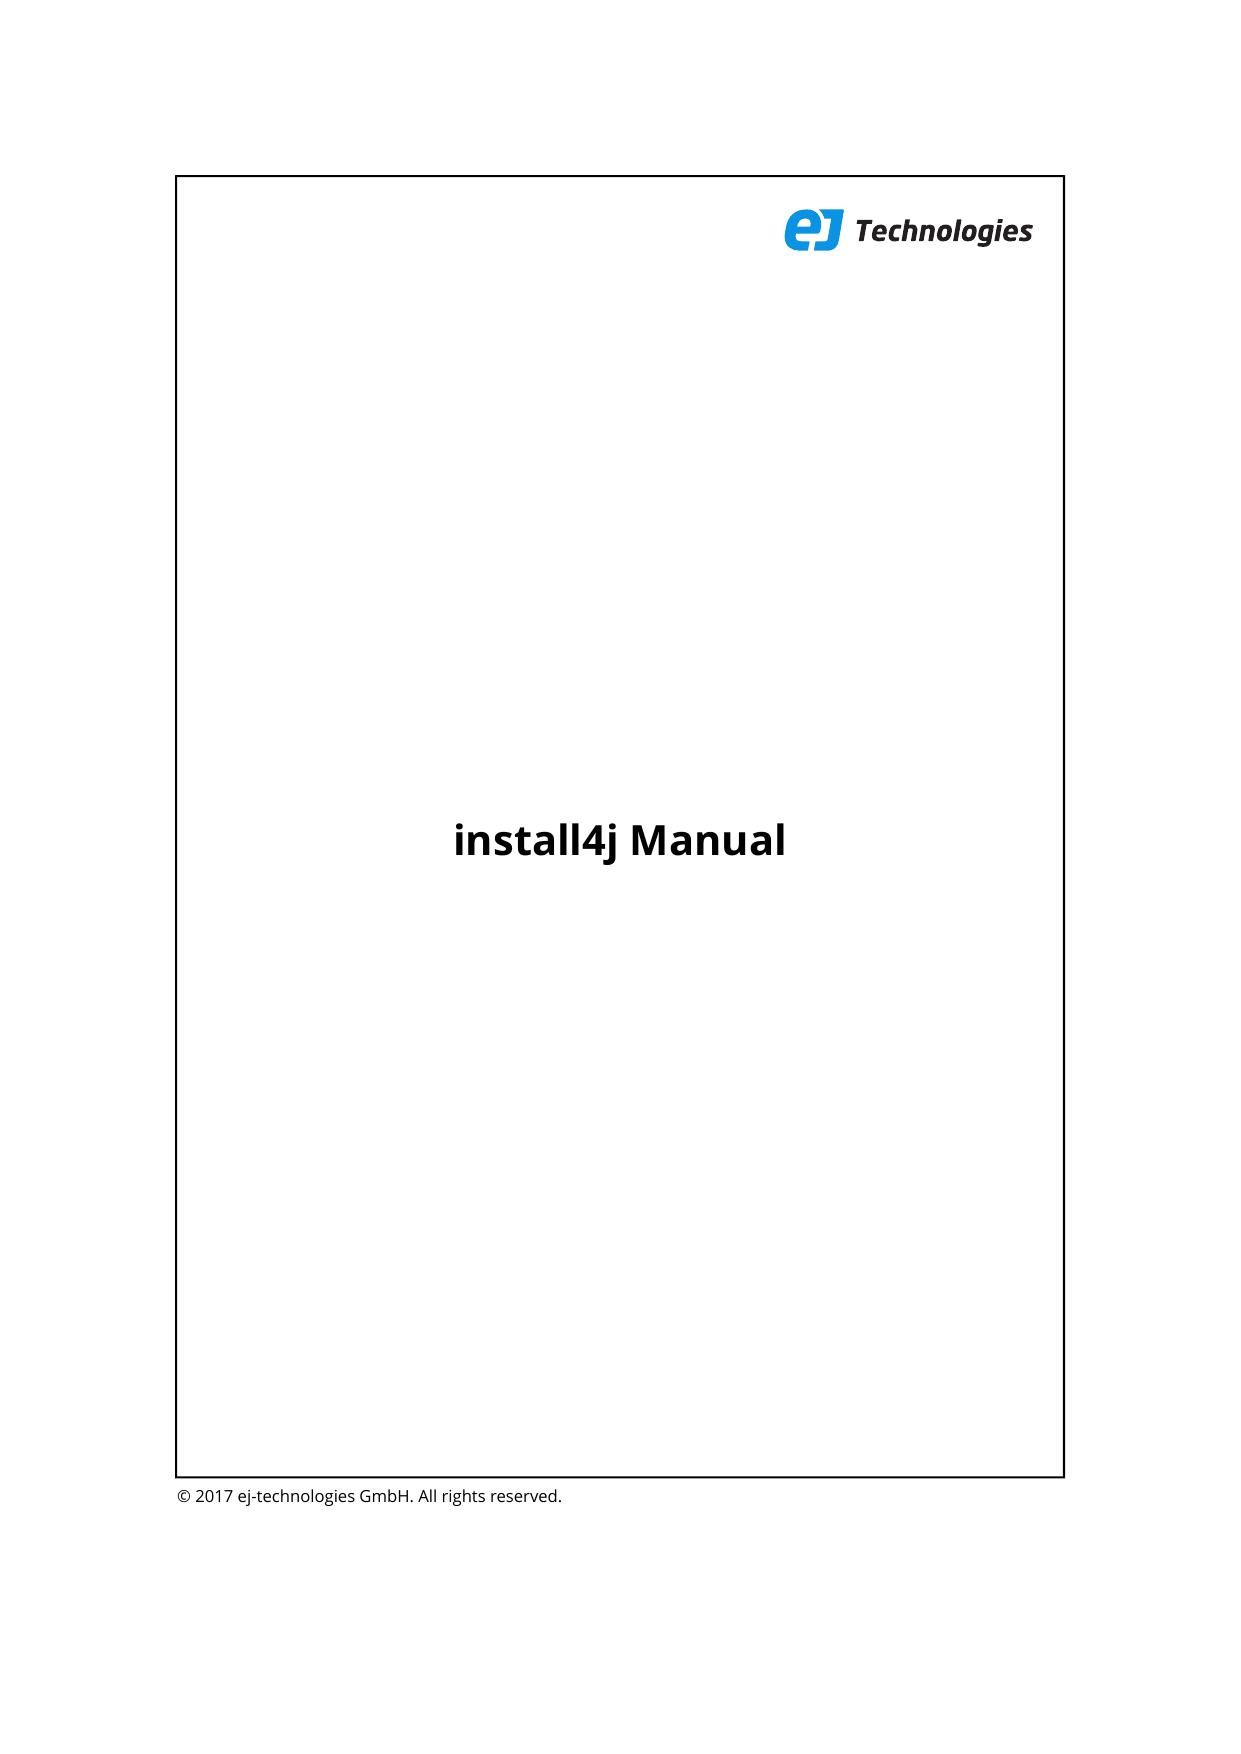 install4j Manual - EJ Technologies | manualzz com